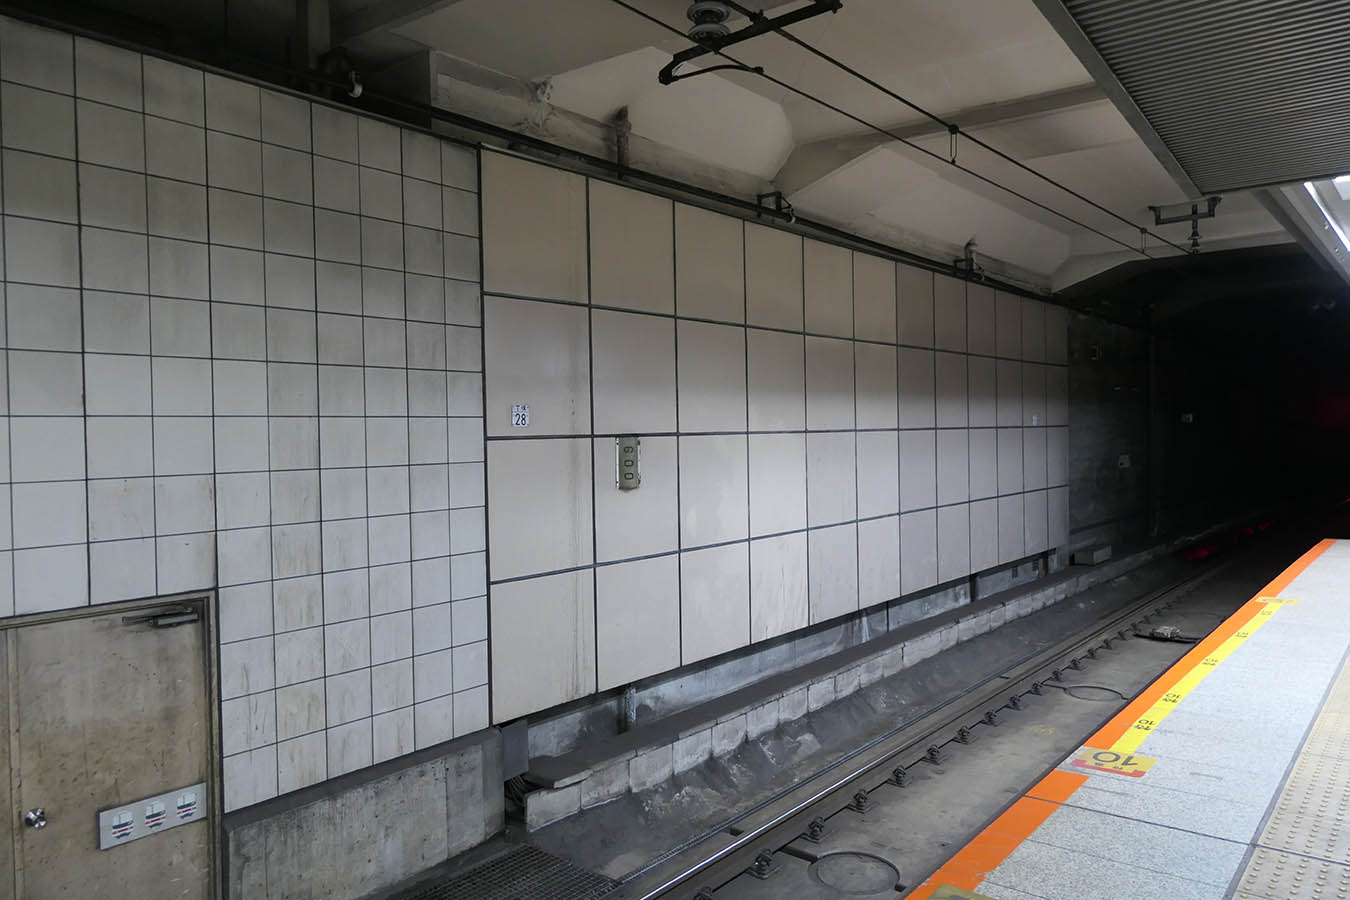 JE01_photo02.jpg